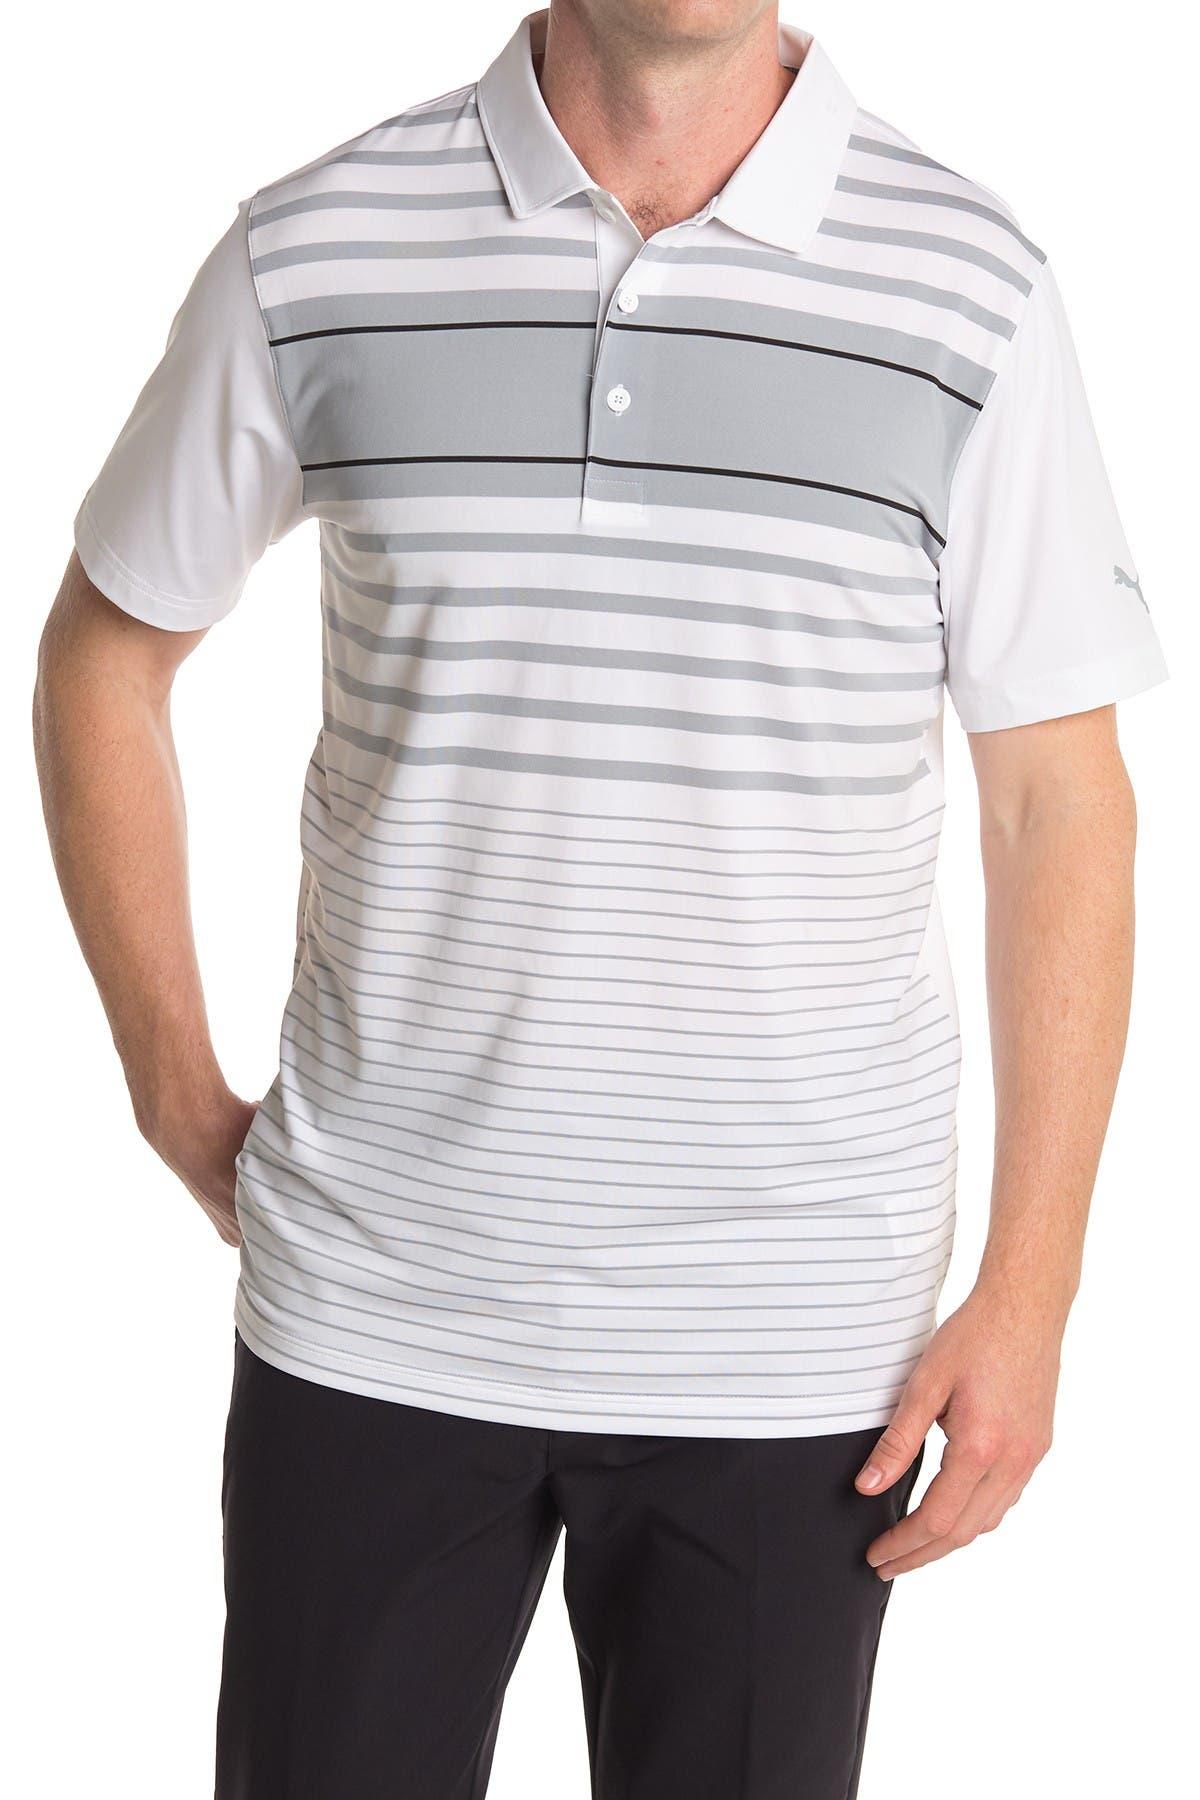 Image of PUMA Grey Spotlight Golf Polo